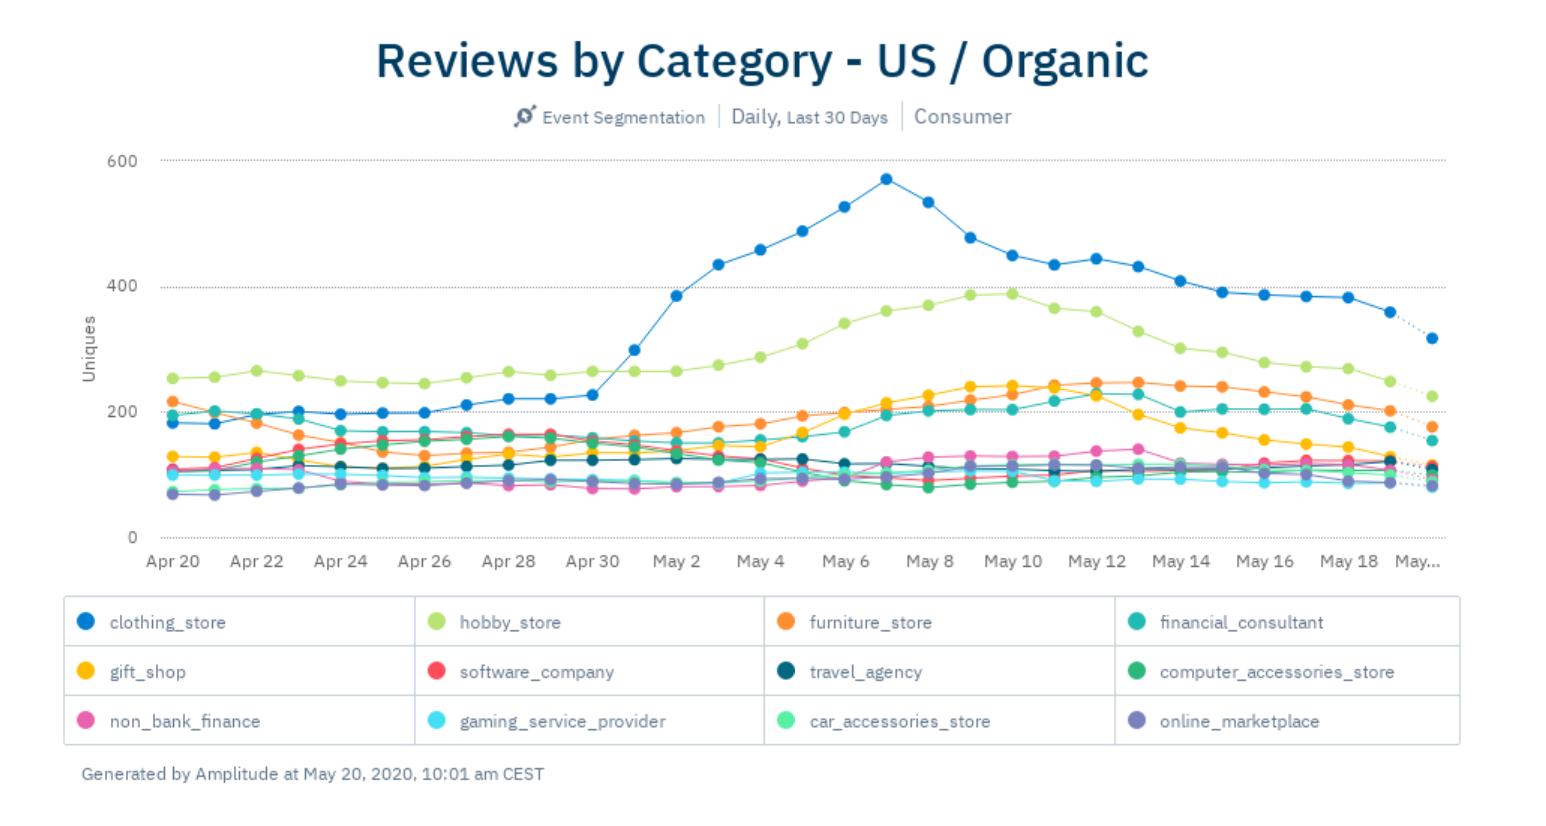 apr6-US-organic-reviews